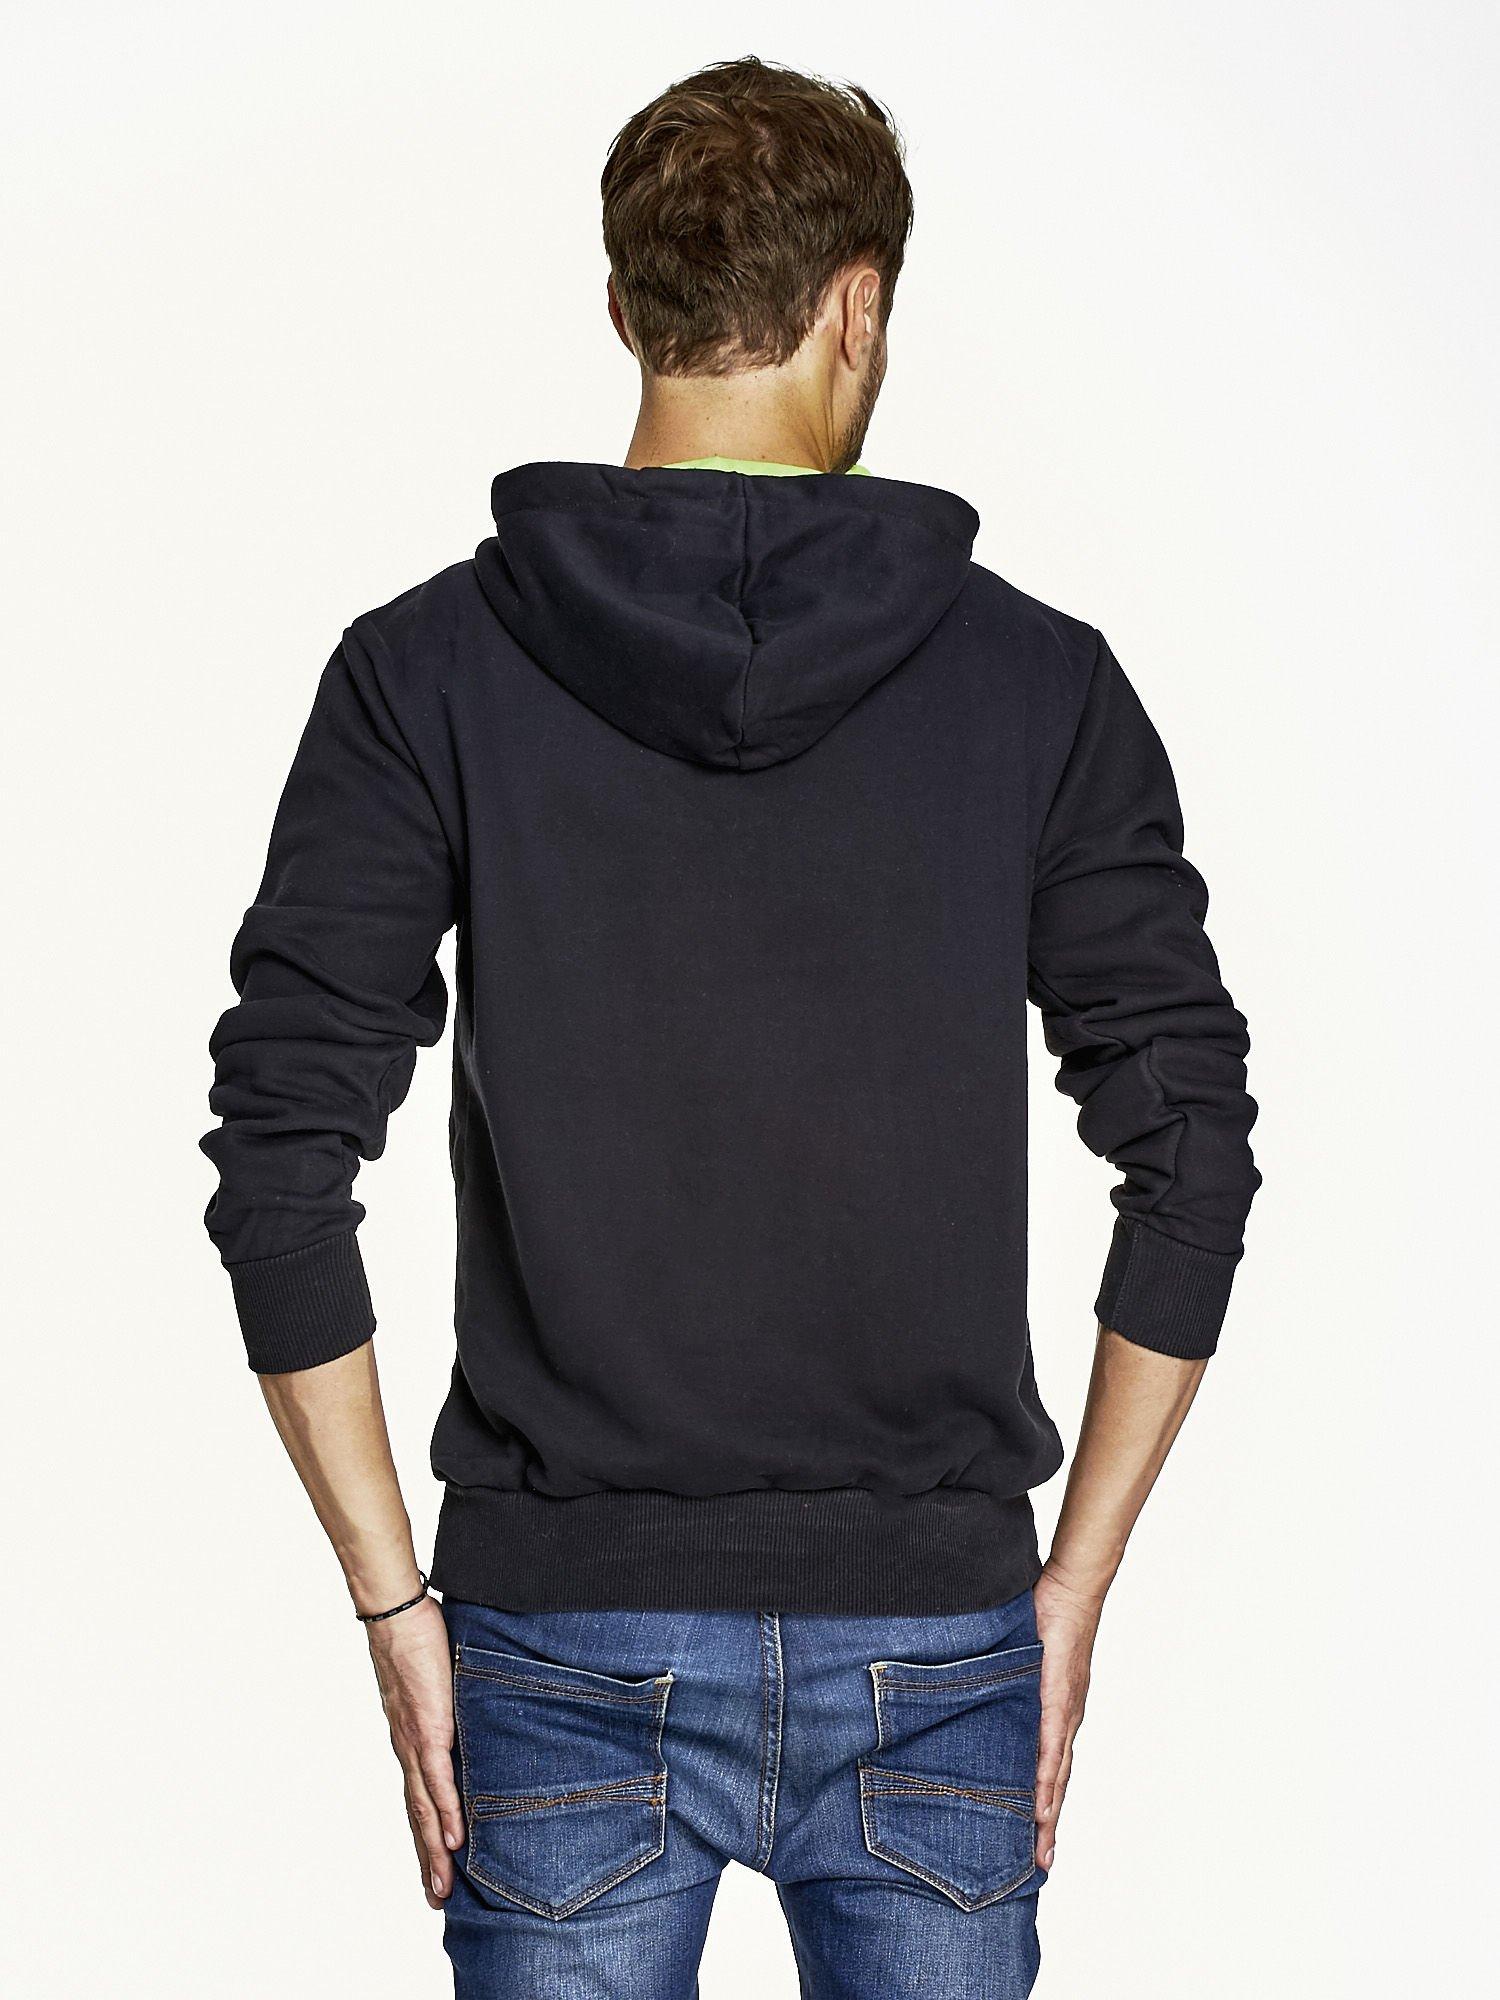 bluza czarna nadruk na plecach nezczyzna